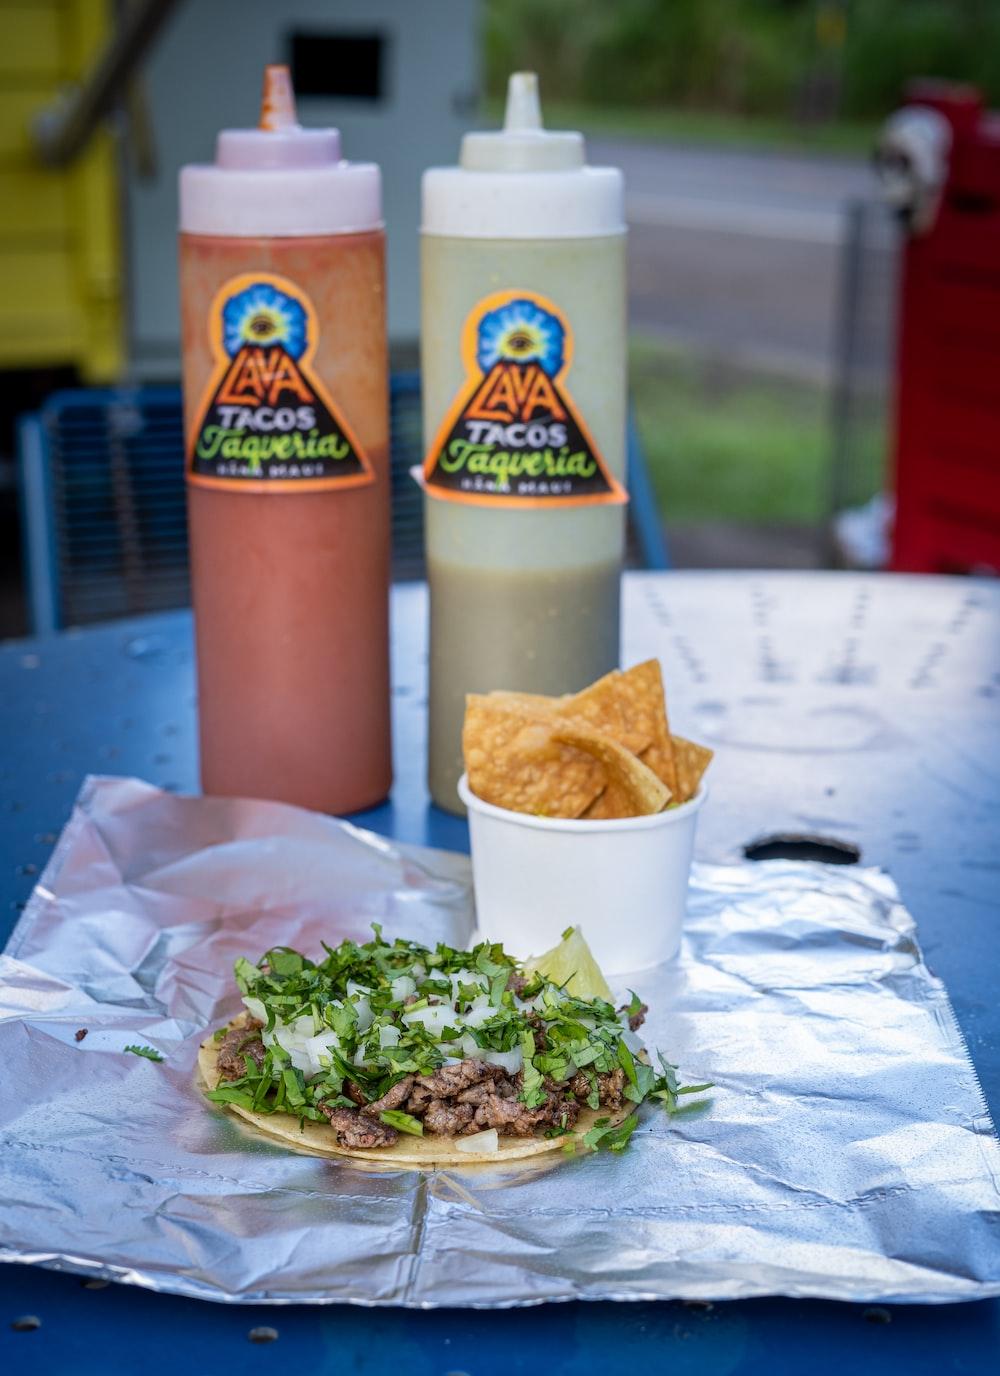 UNKs taco seasoning mix